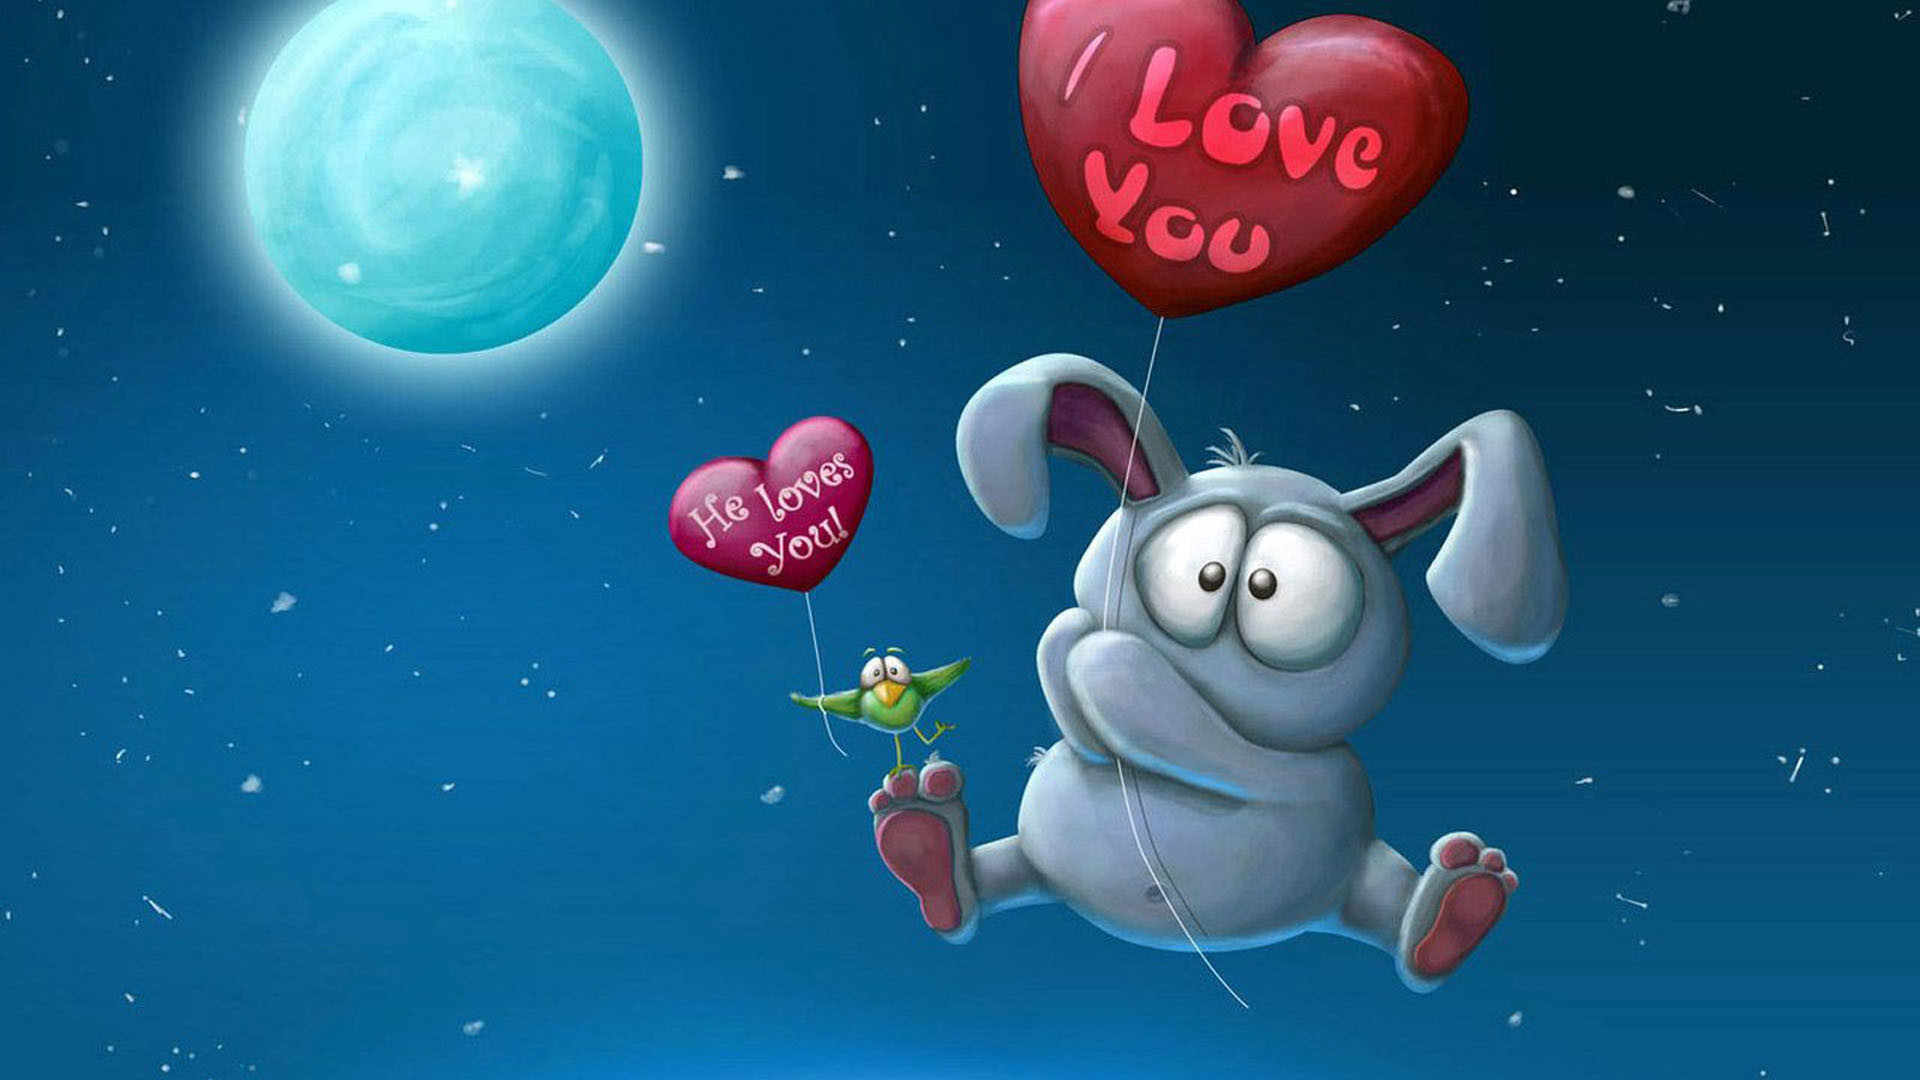 I-Love-You-Cartoon-hd-wallpapers